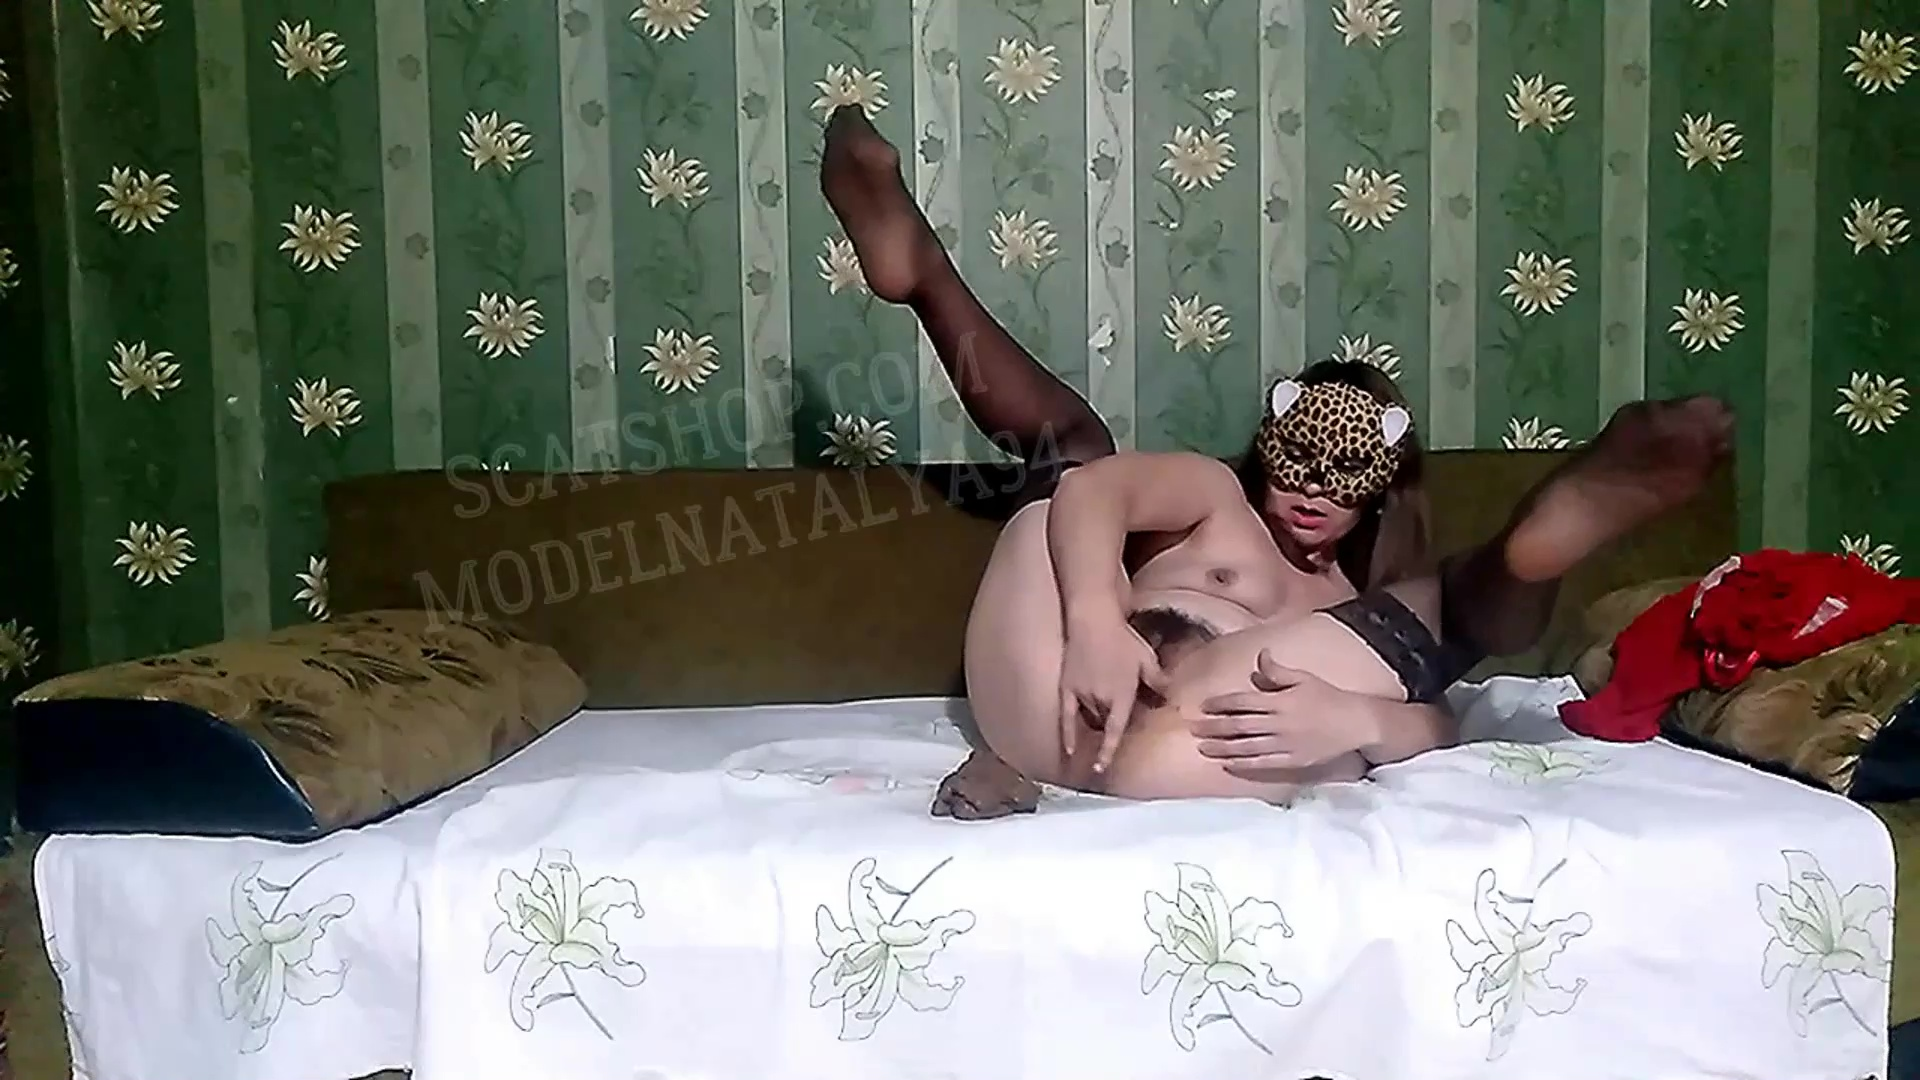 ModelNatalya94 - Olga fucks and masturbates on the bed